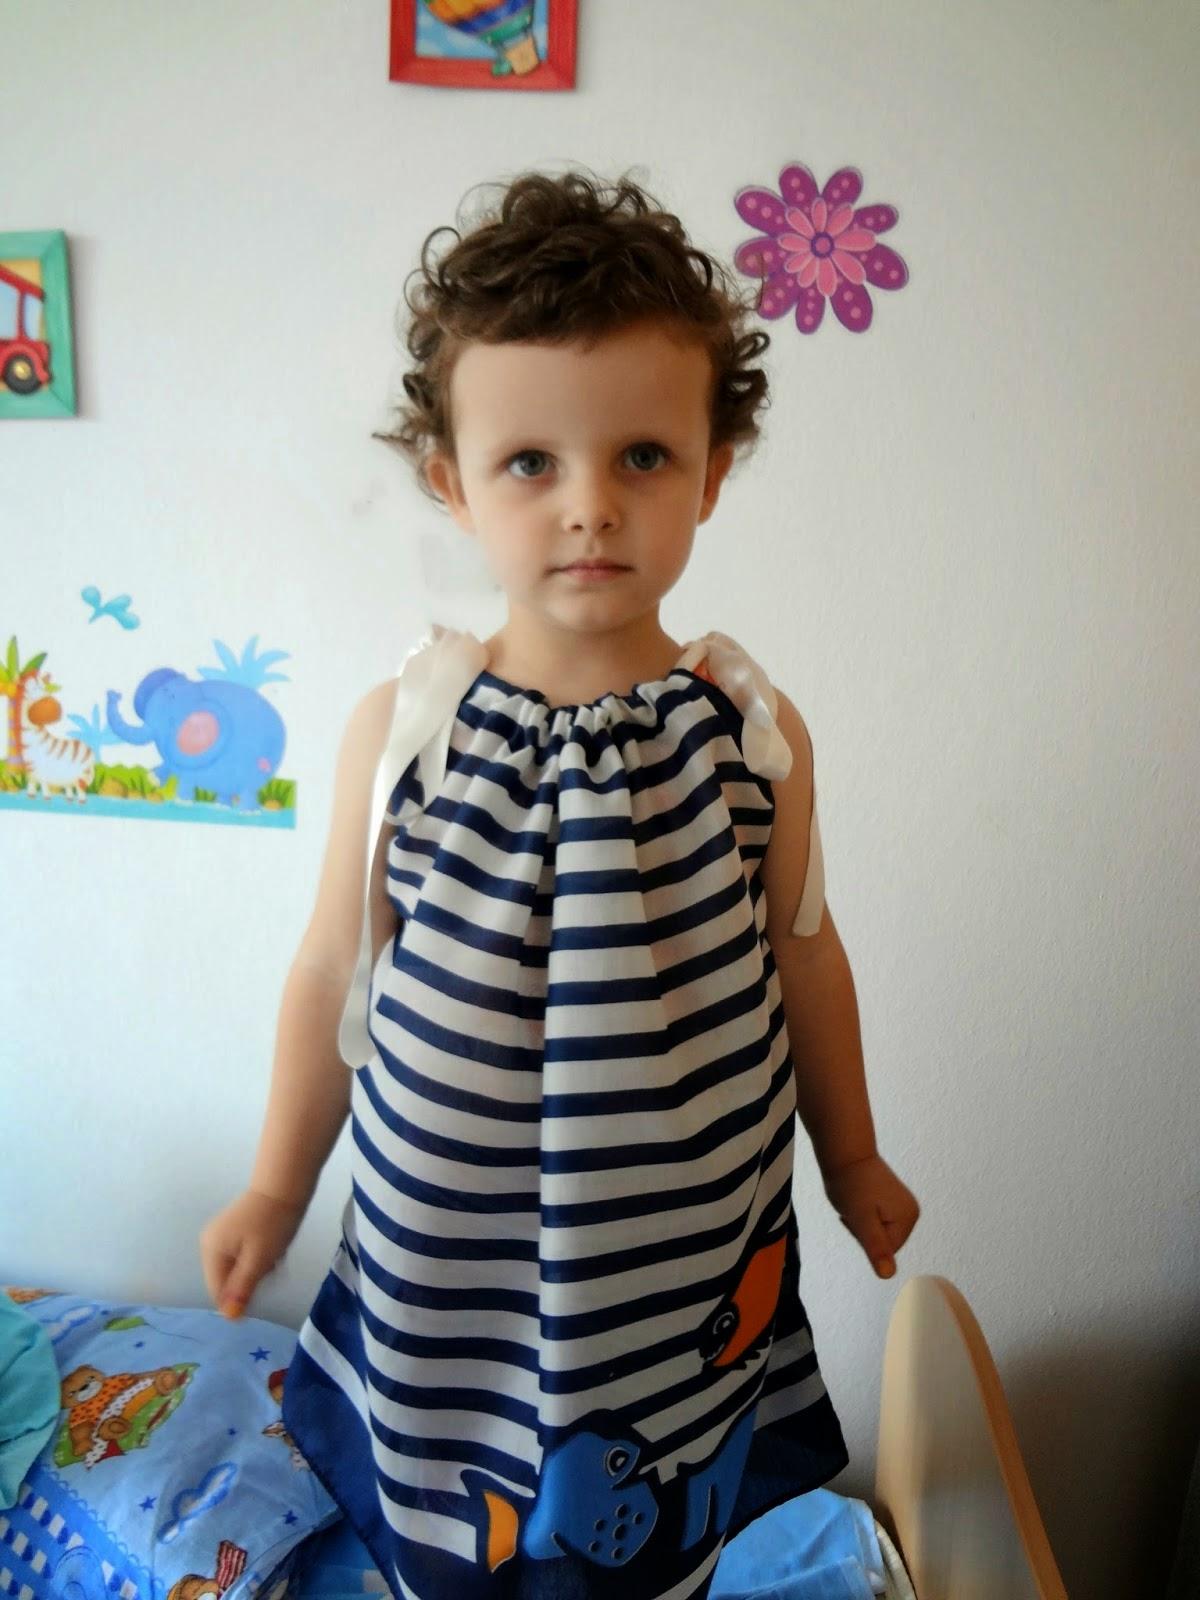 http://thelittletreasures.blogspot.com/2014/06/scarves-into-dress-tutorial.html